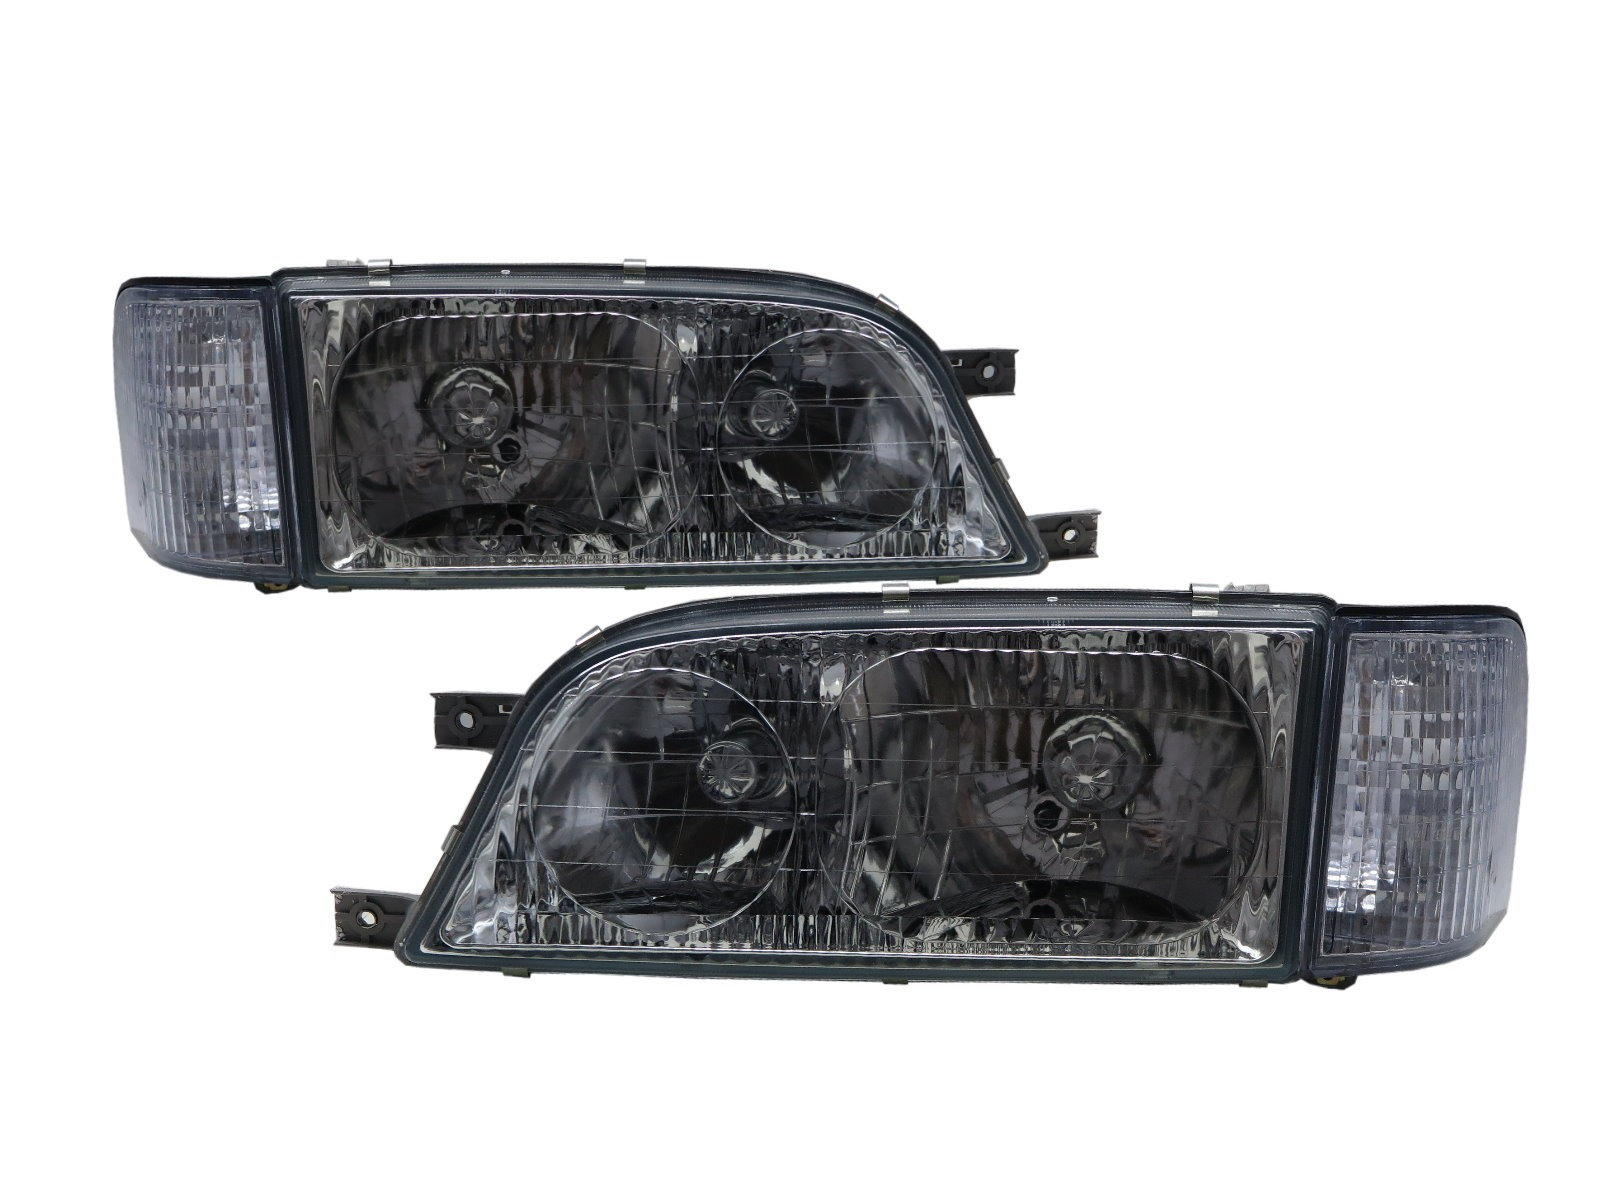 CrazyTheGod Istana 1995-2004 Minibus/VAN 4D Clear W/ Corner Lamp Headlight Headlamp Chrome for SsangYong LHD